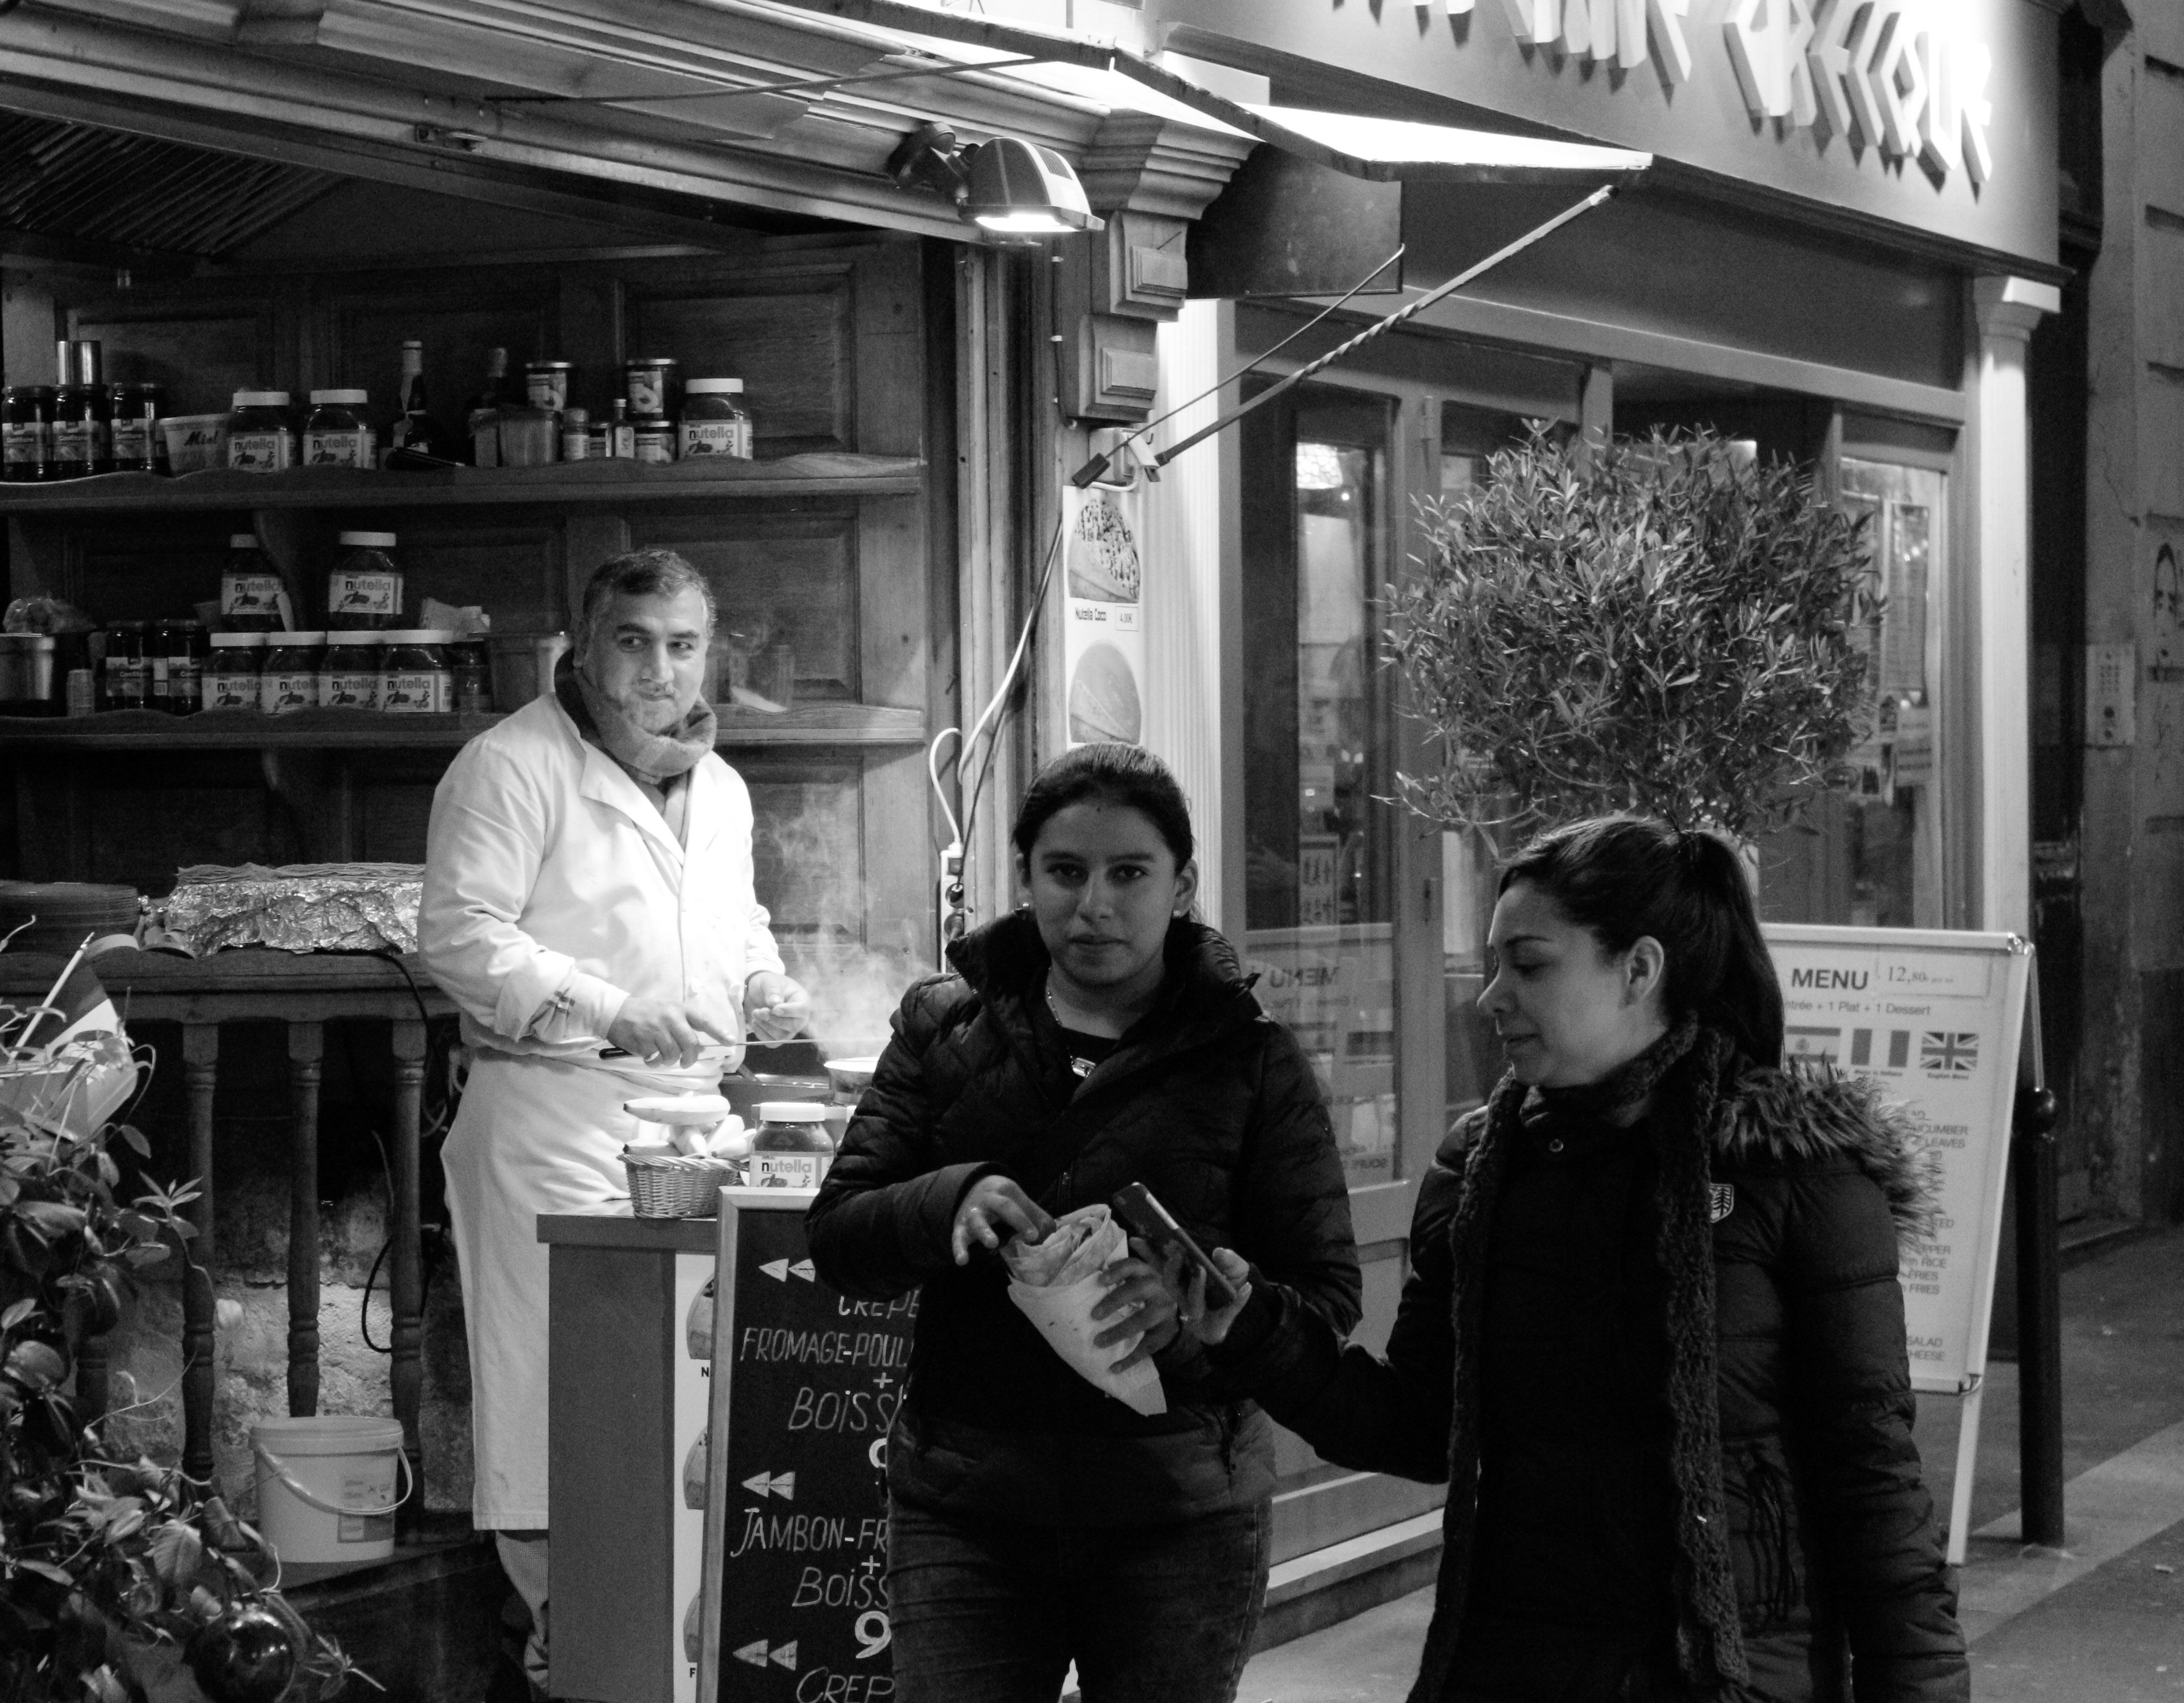 rue saint &ndre des arts - 2015